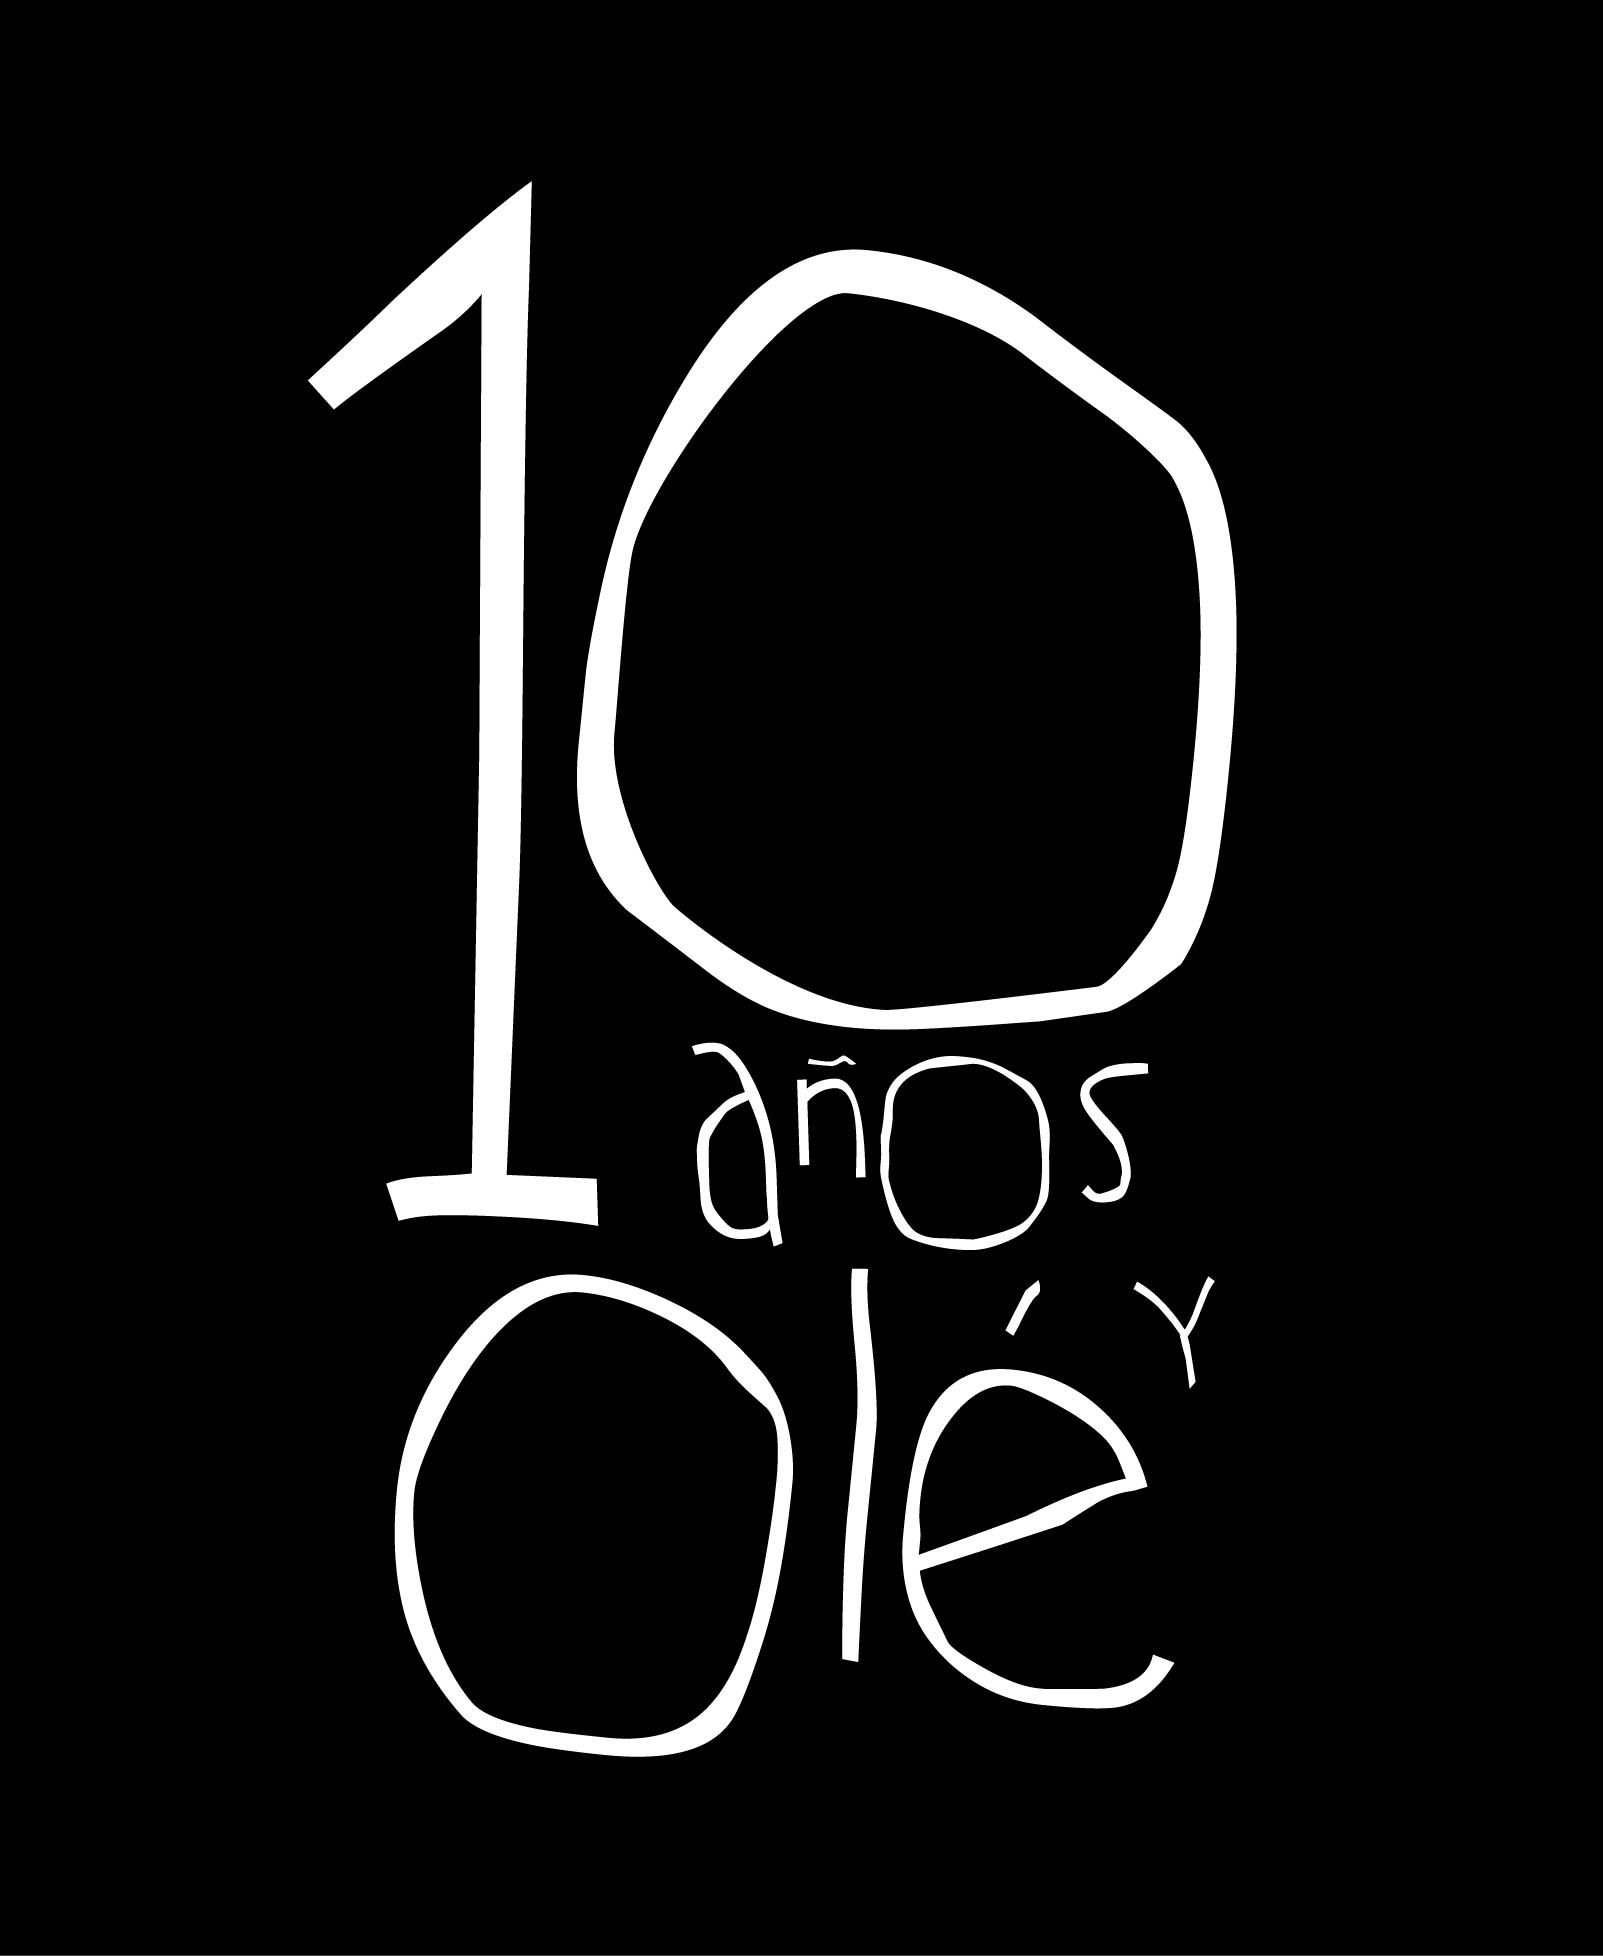 Logo 10 aniversario blanco.jpg